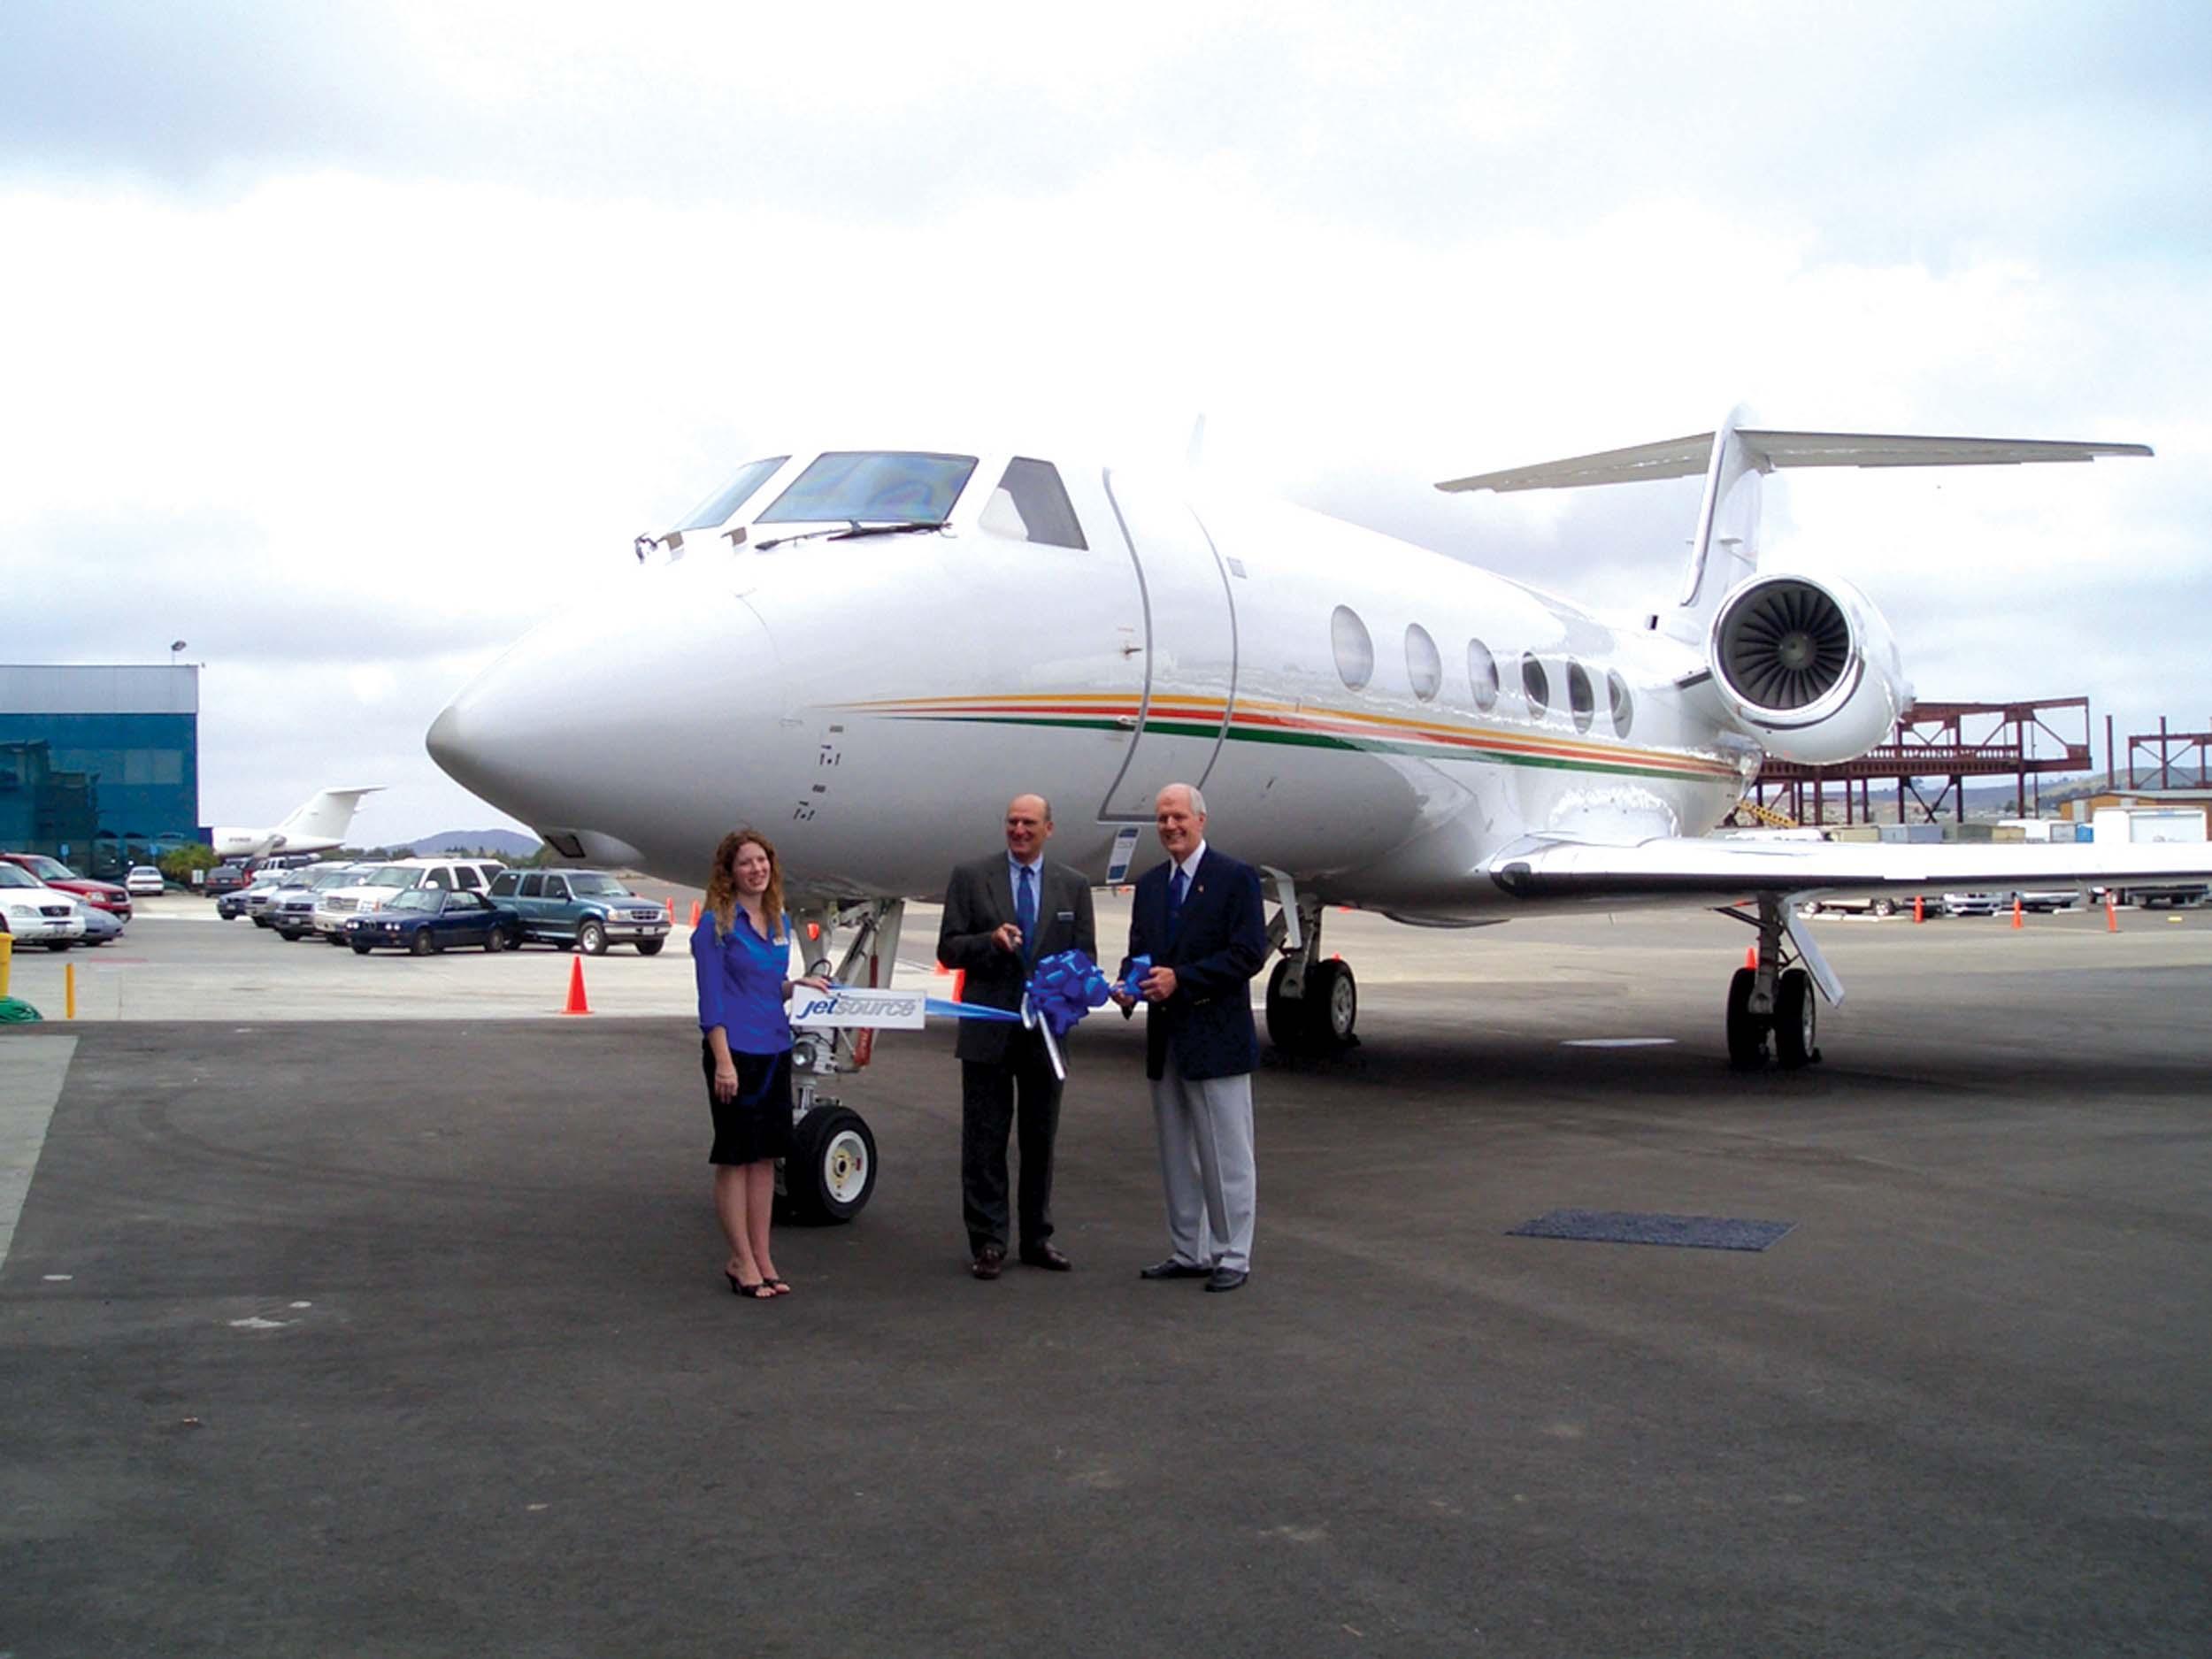 Jet Source Celebrates New Business Aviation Center with Open House Celebration